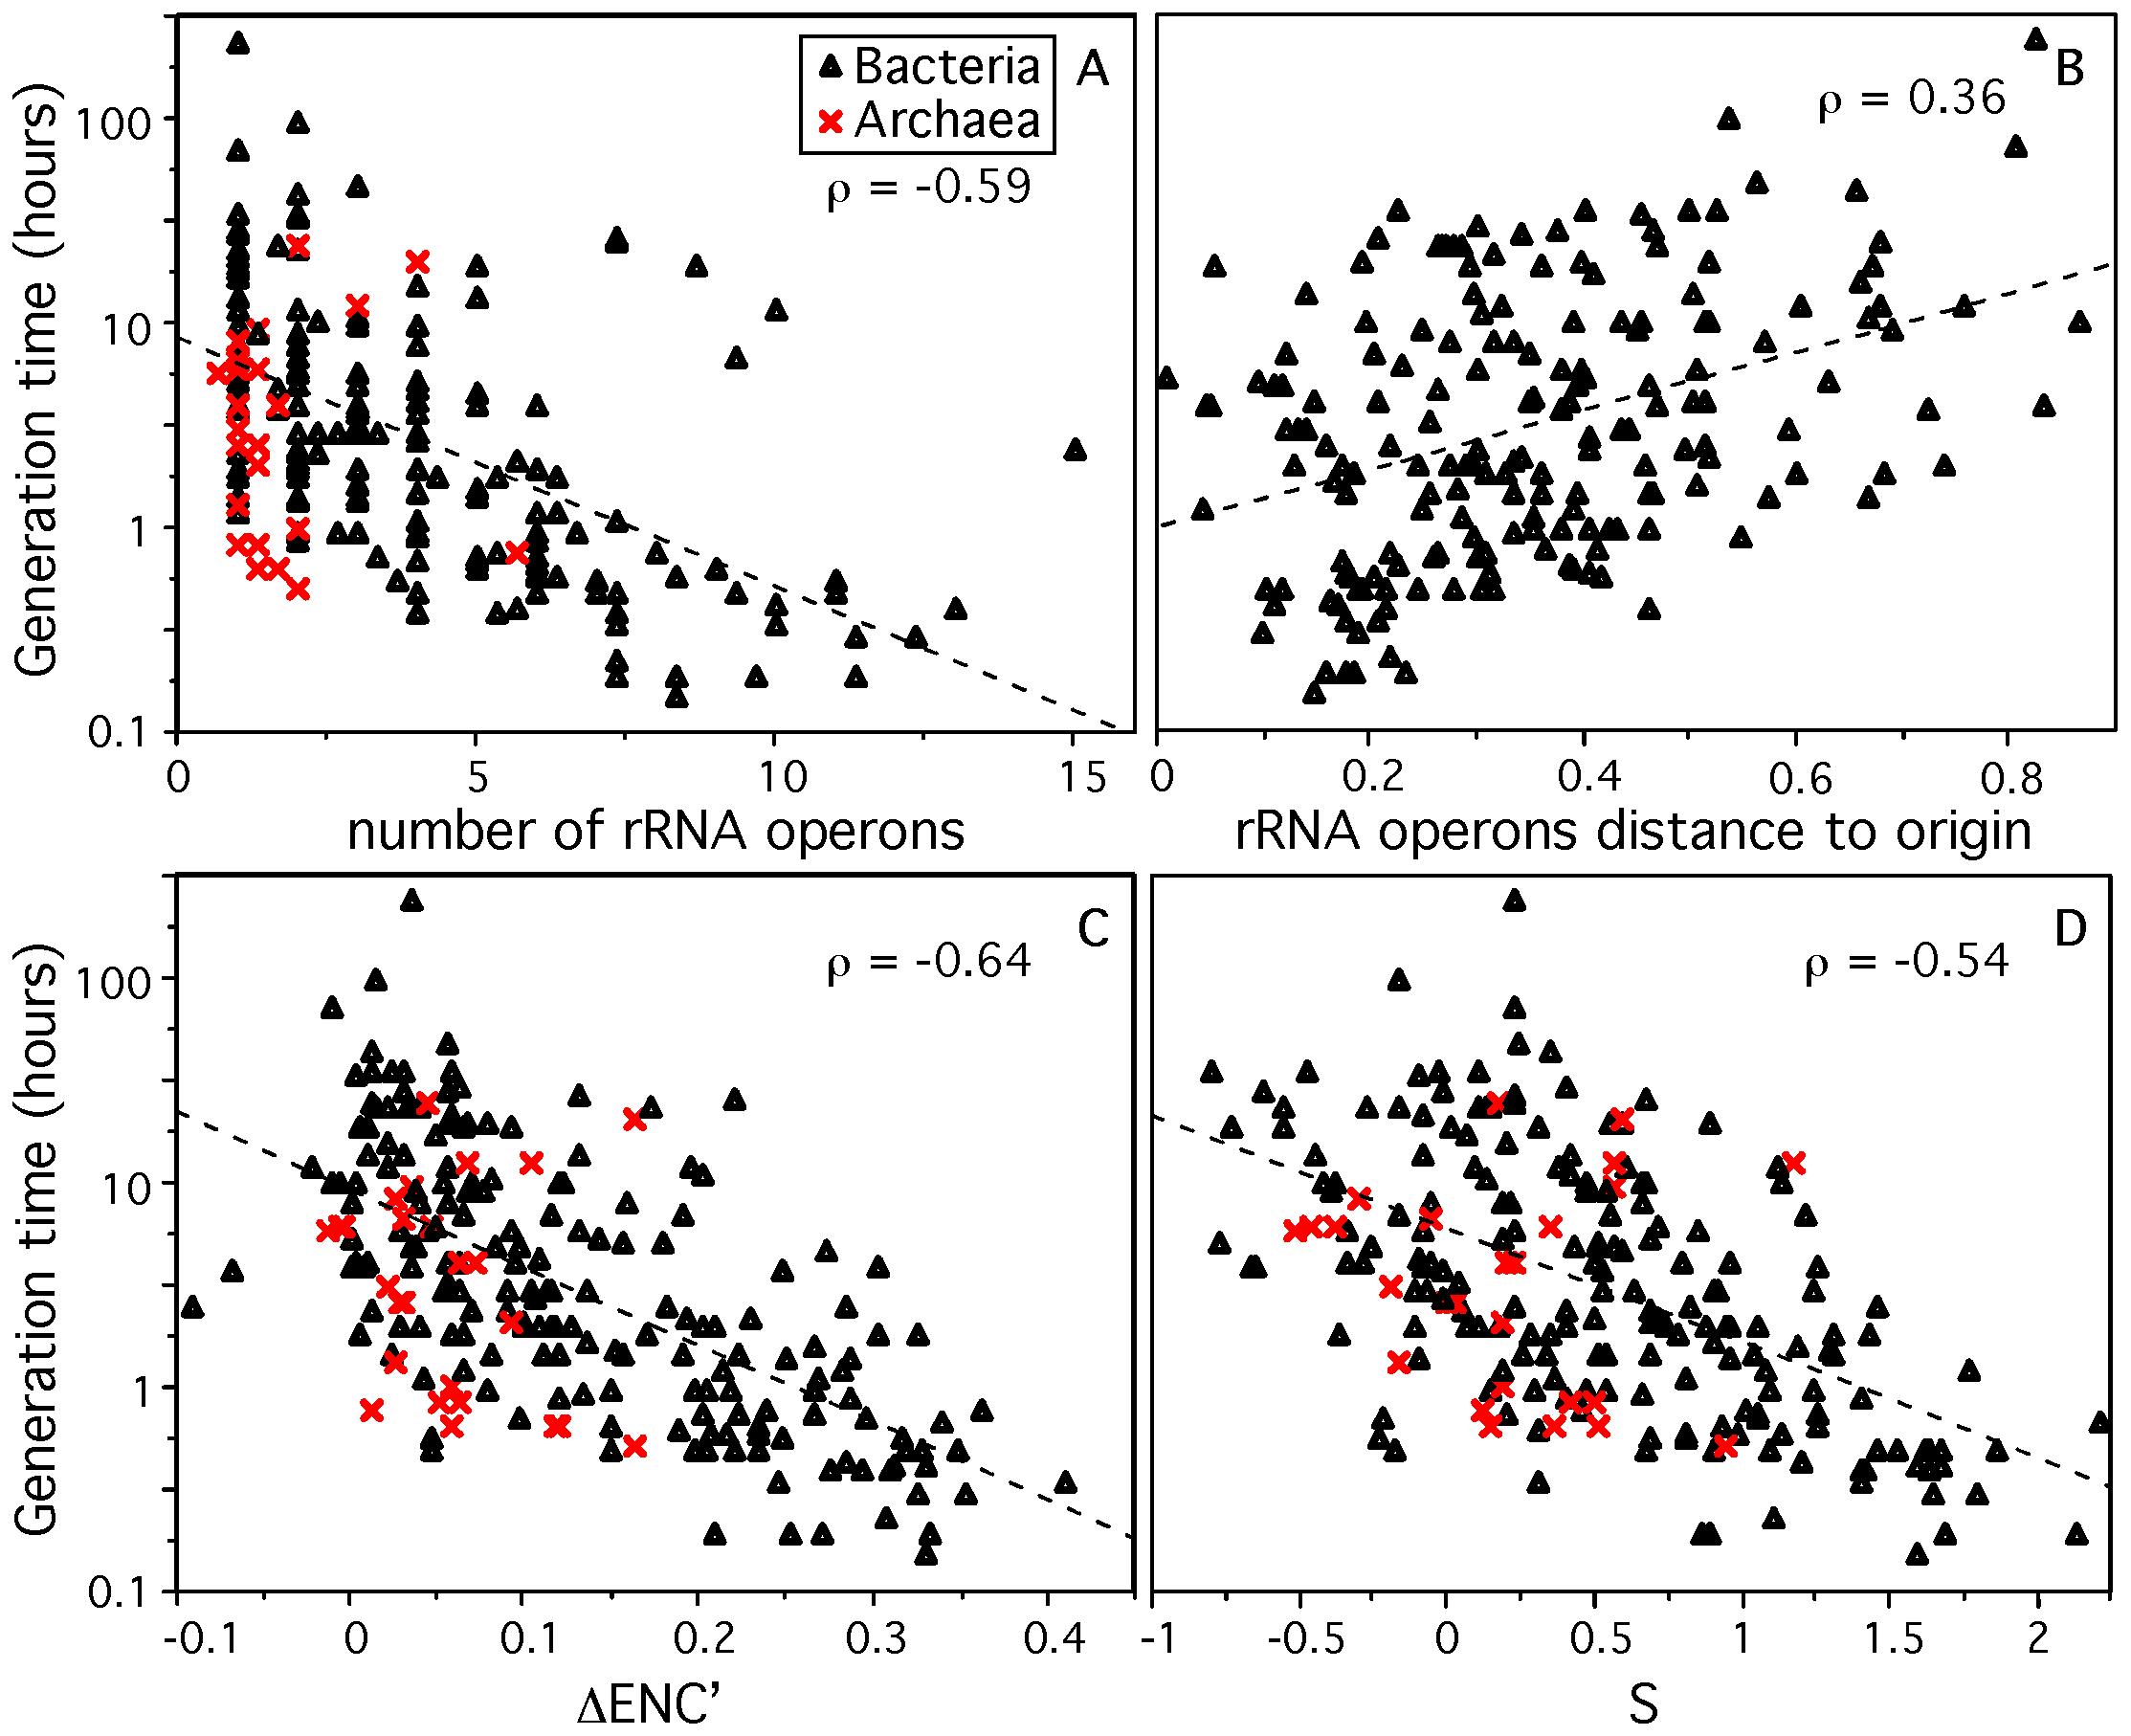 Genomic signatures correlated to minimum generation time (d) for 214 prokaryotes.